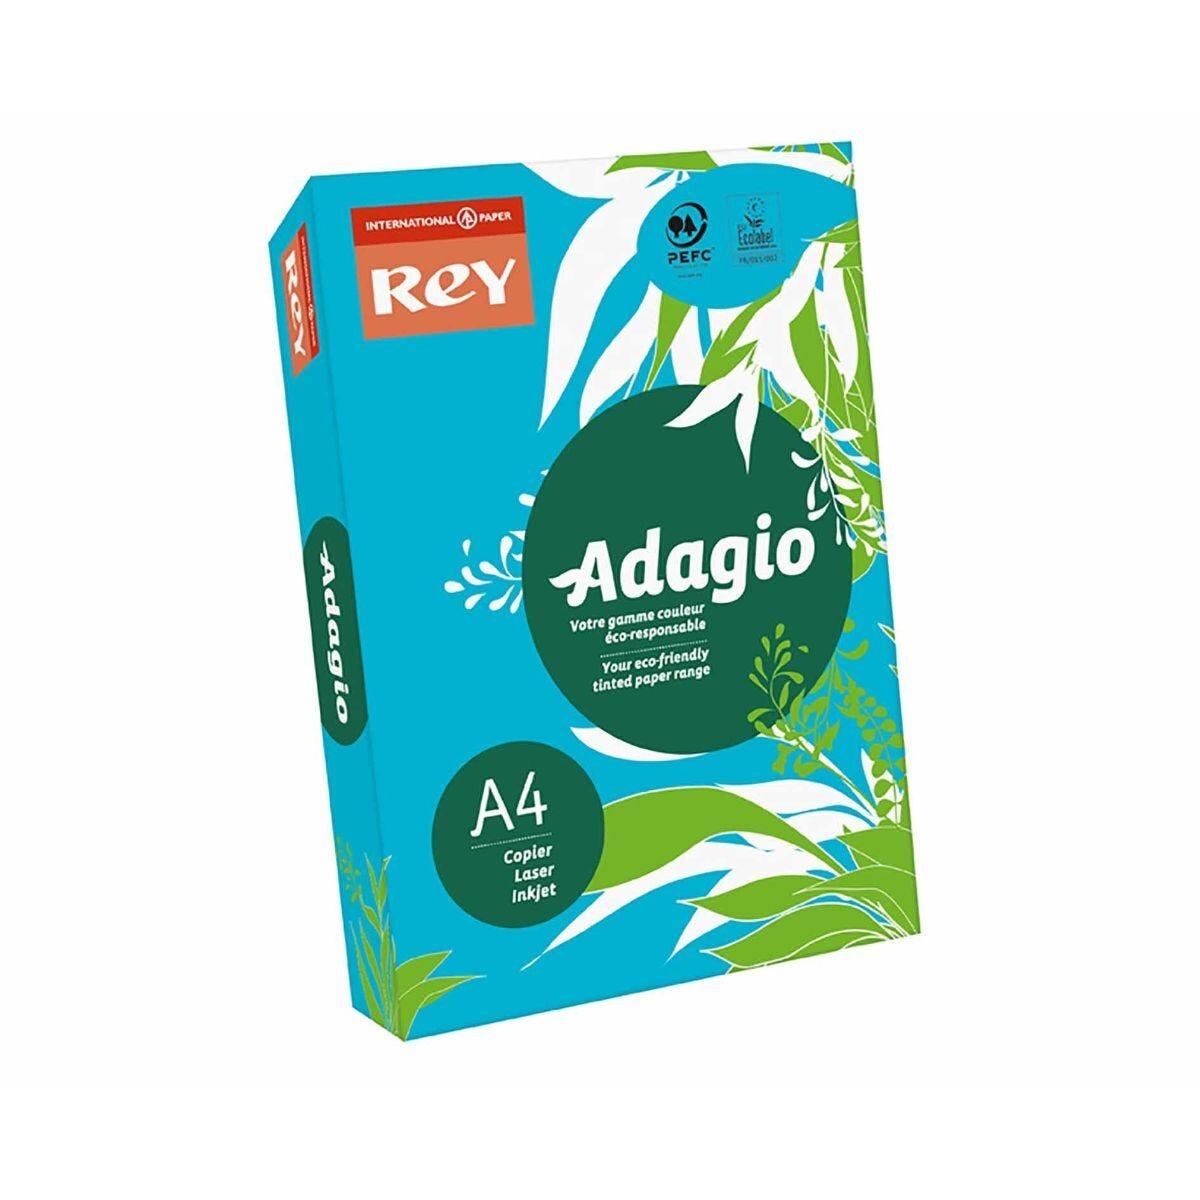 Adagio Ream of Bright Coloured Copier Paper A4 80gsm 500 Sheets Deep Blue